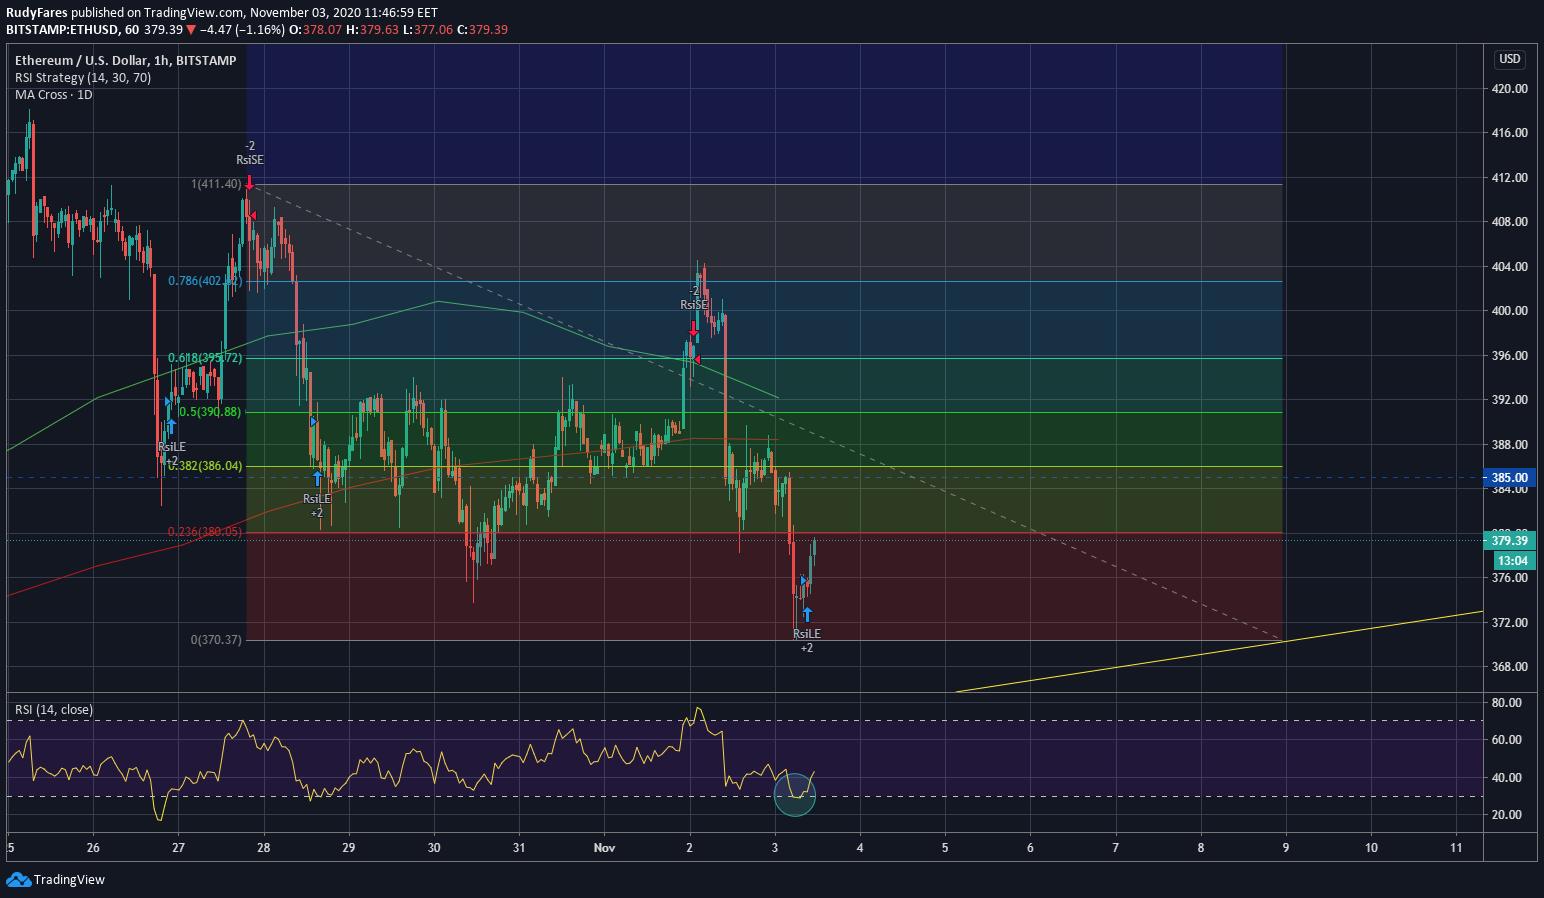 ETH/USD price 1H chart, Fibonacci Retracement from last week